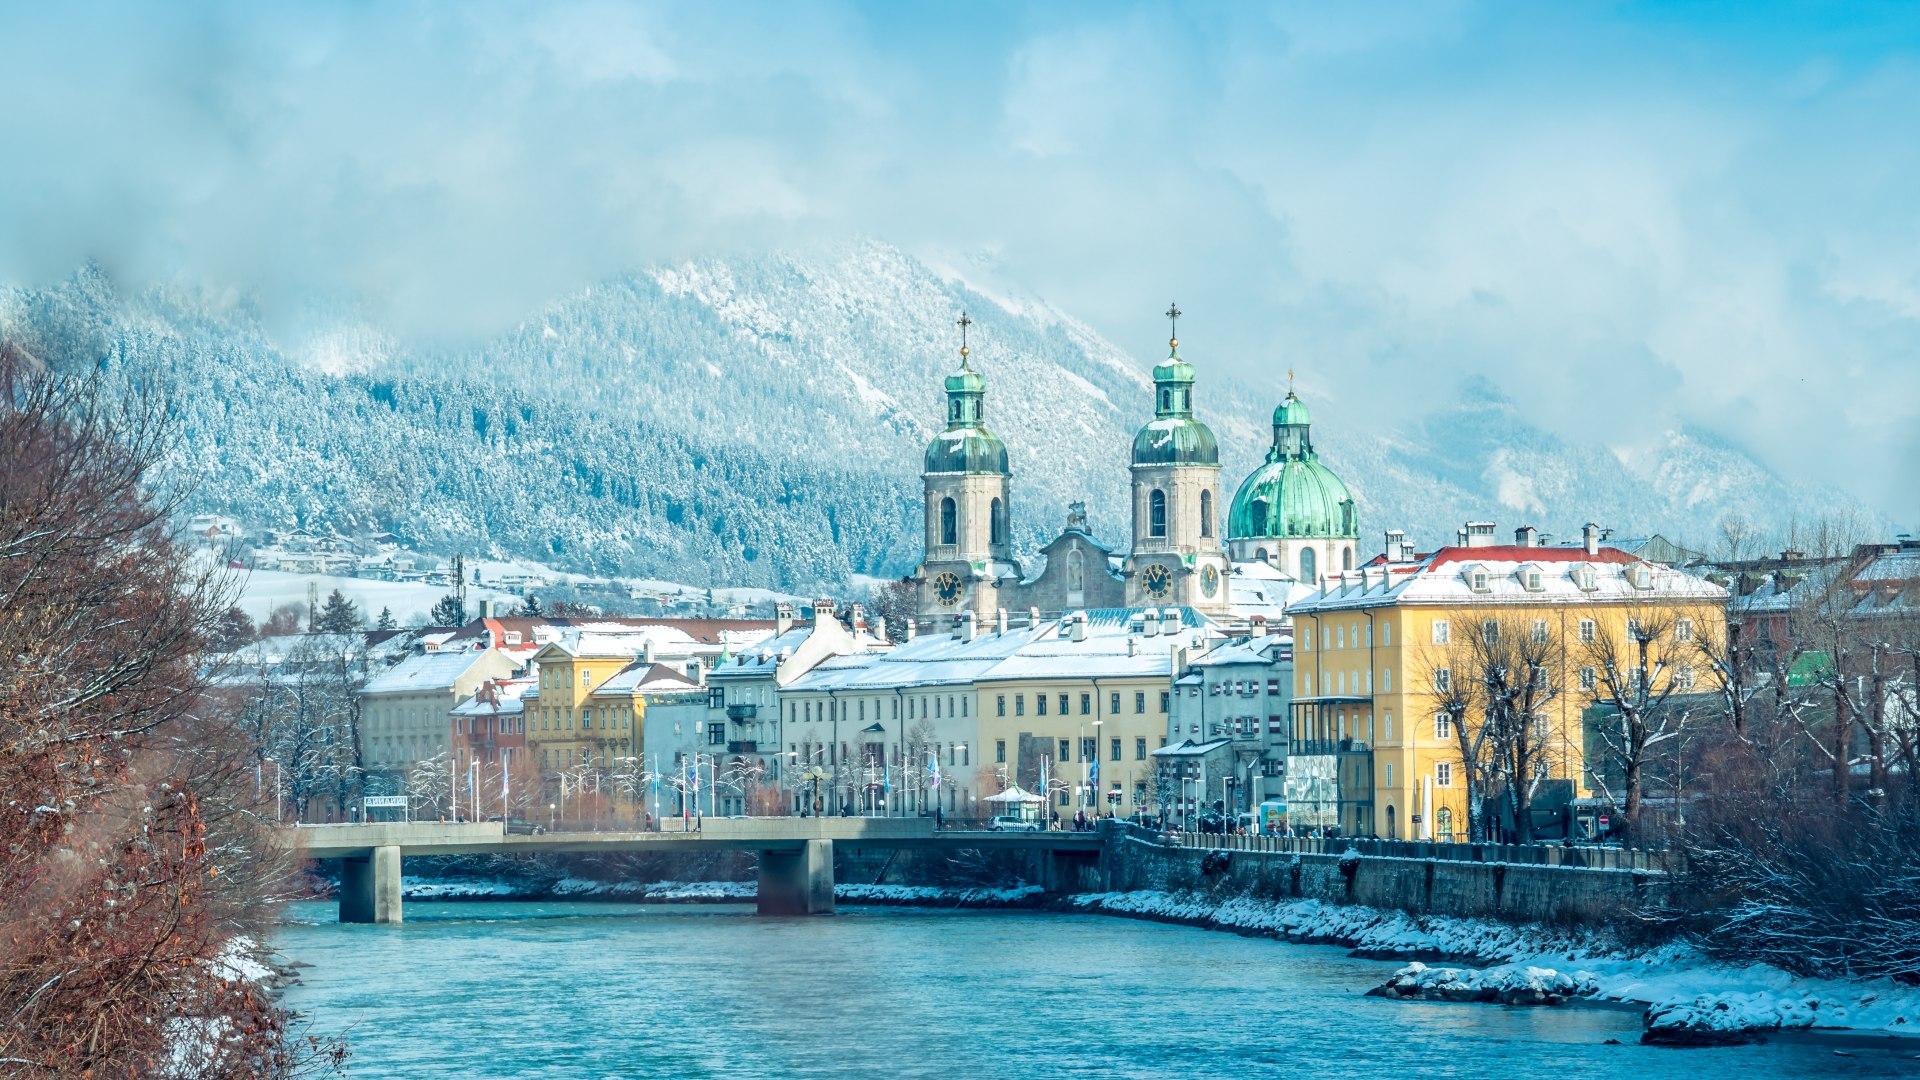 Tagesausflug Innsbruck, © Rosara